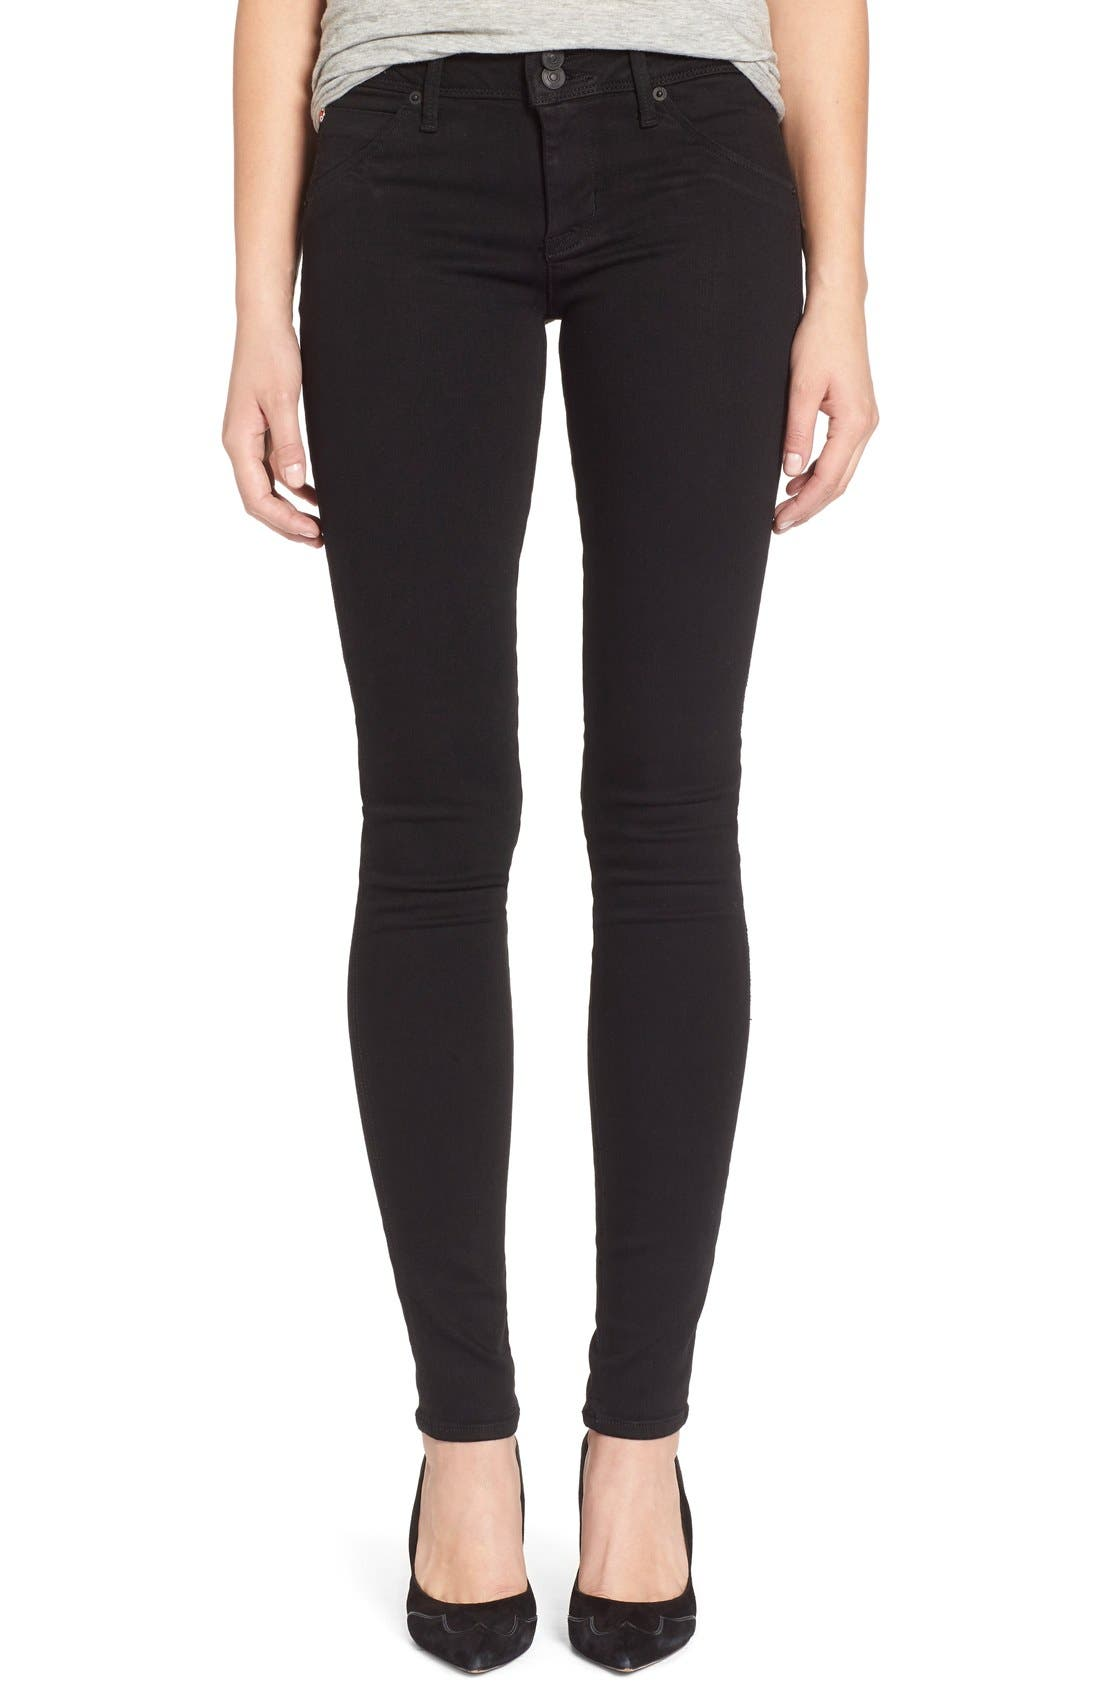 Main Image - Hudson Jeans 'Collin' Supermodel Skinny Jeans (Black) (Long)